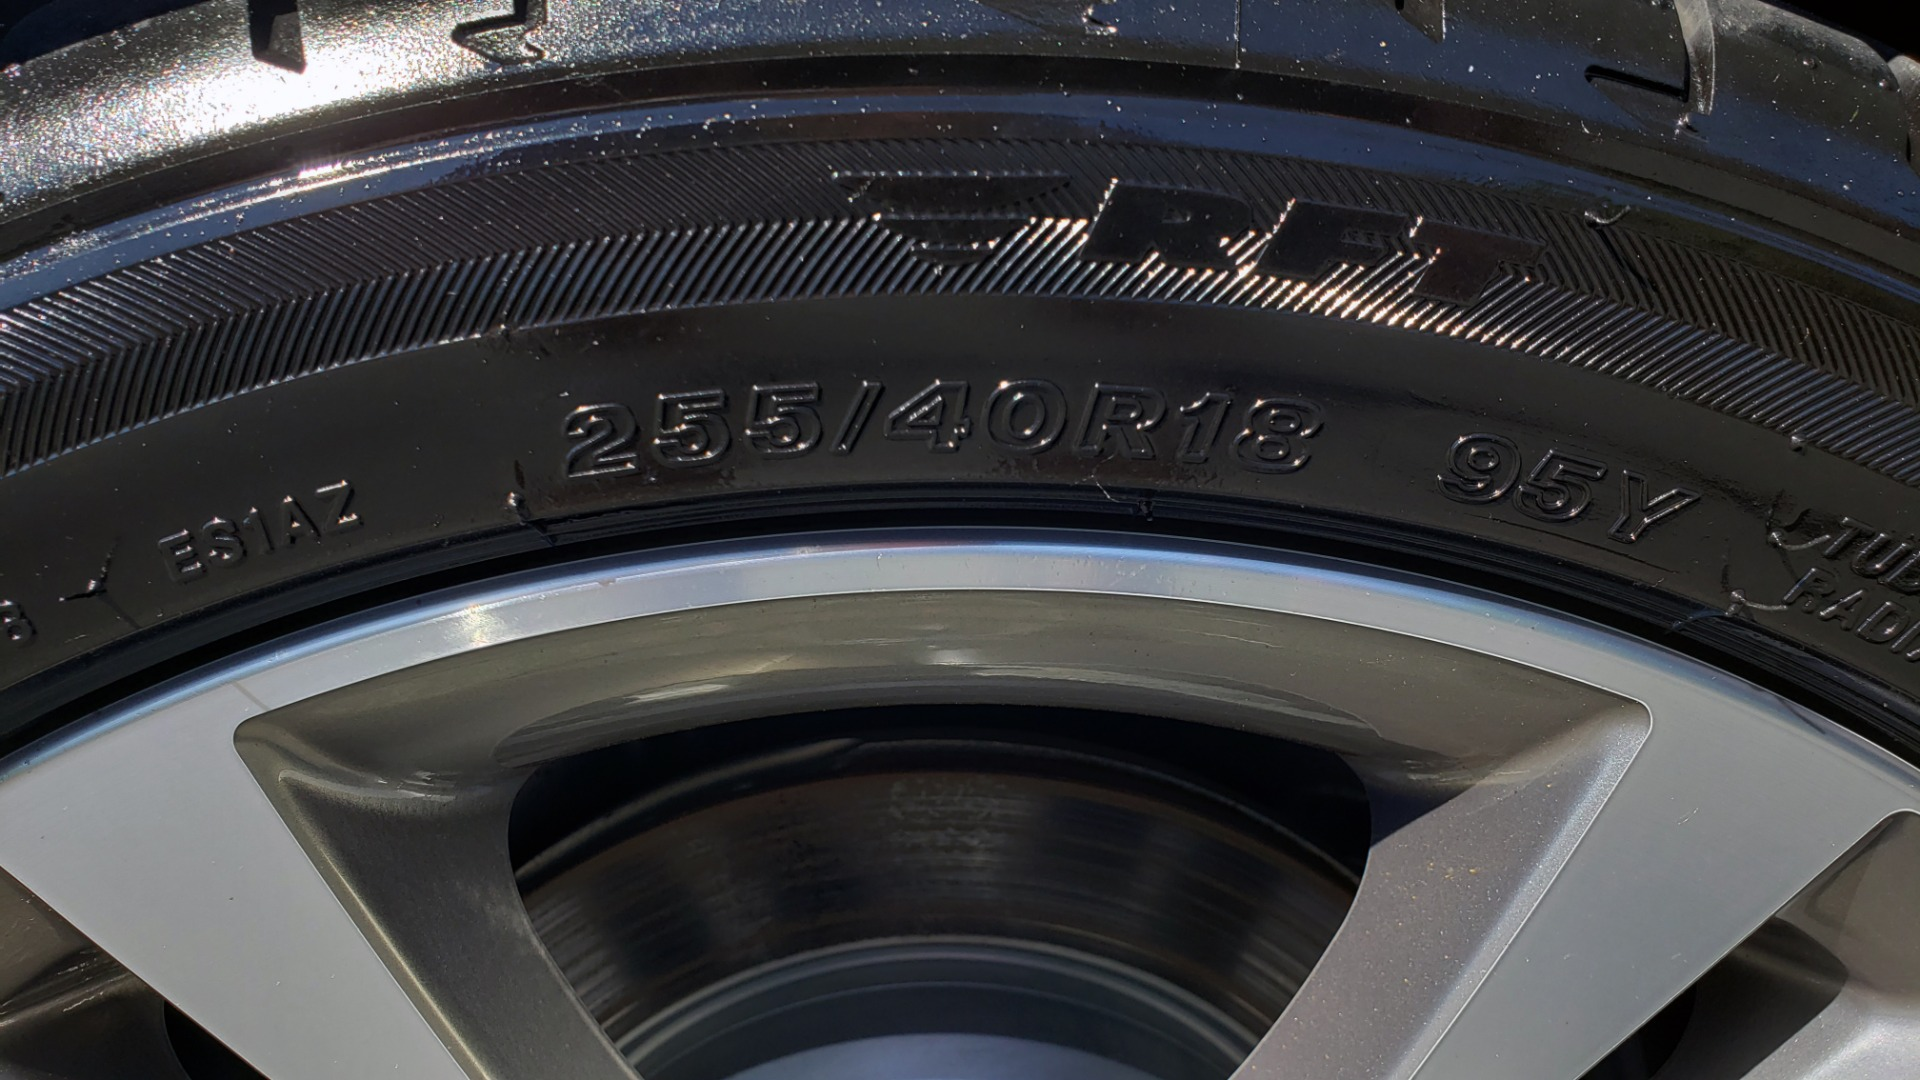 Used 2017 BMW 3 SERIES 330I SPORT SEDAN / DRVR ASST PKG / SUNROOF / REARVIEW for sale Sold at Formula Imports in Charlotte NC 28227 80